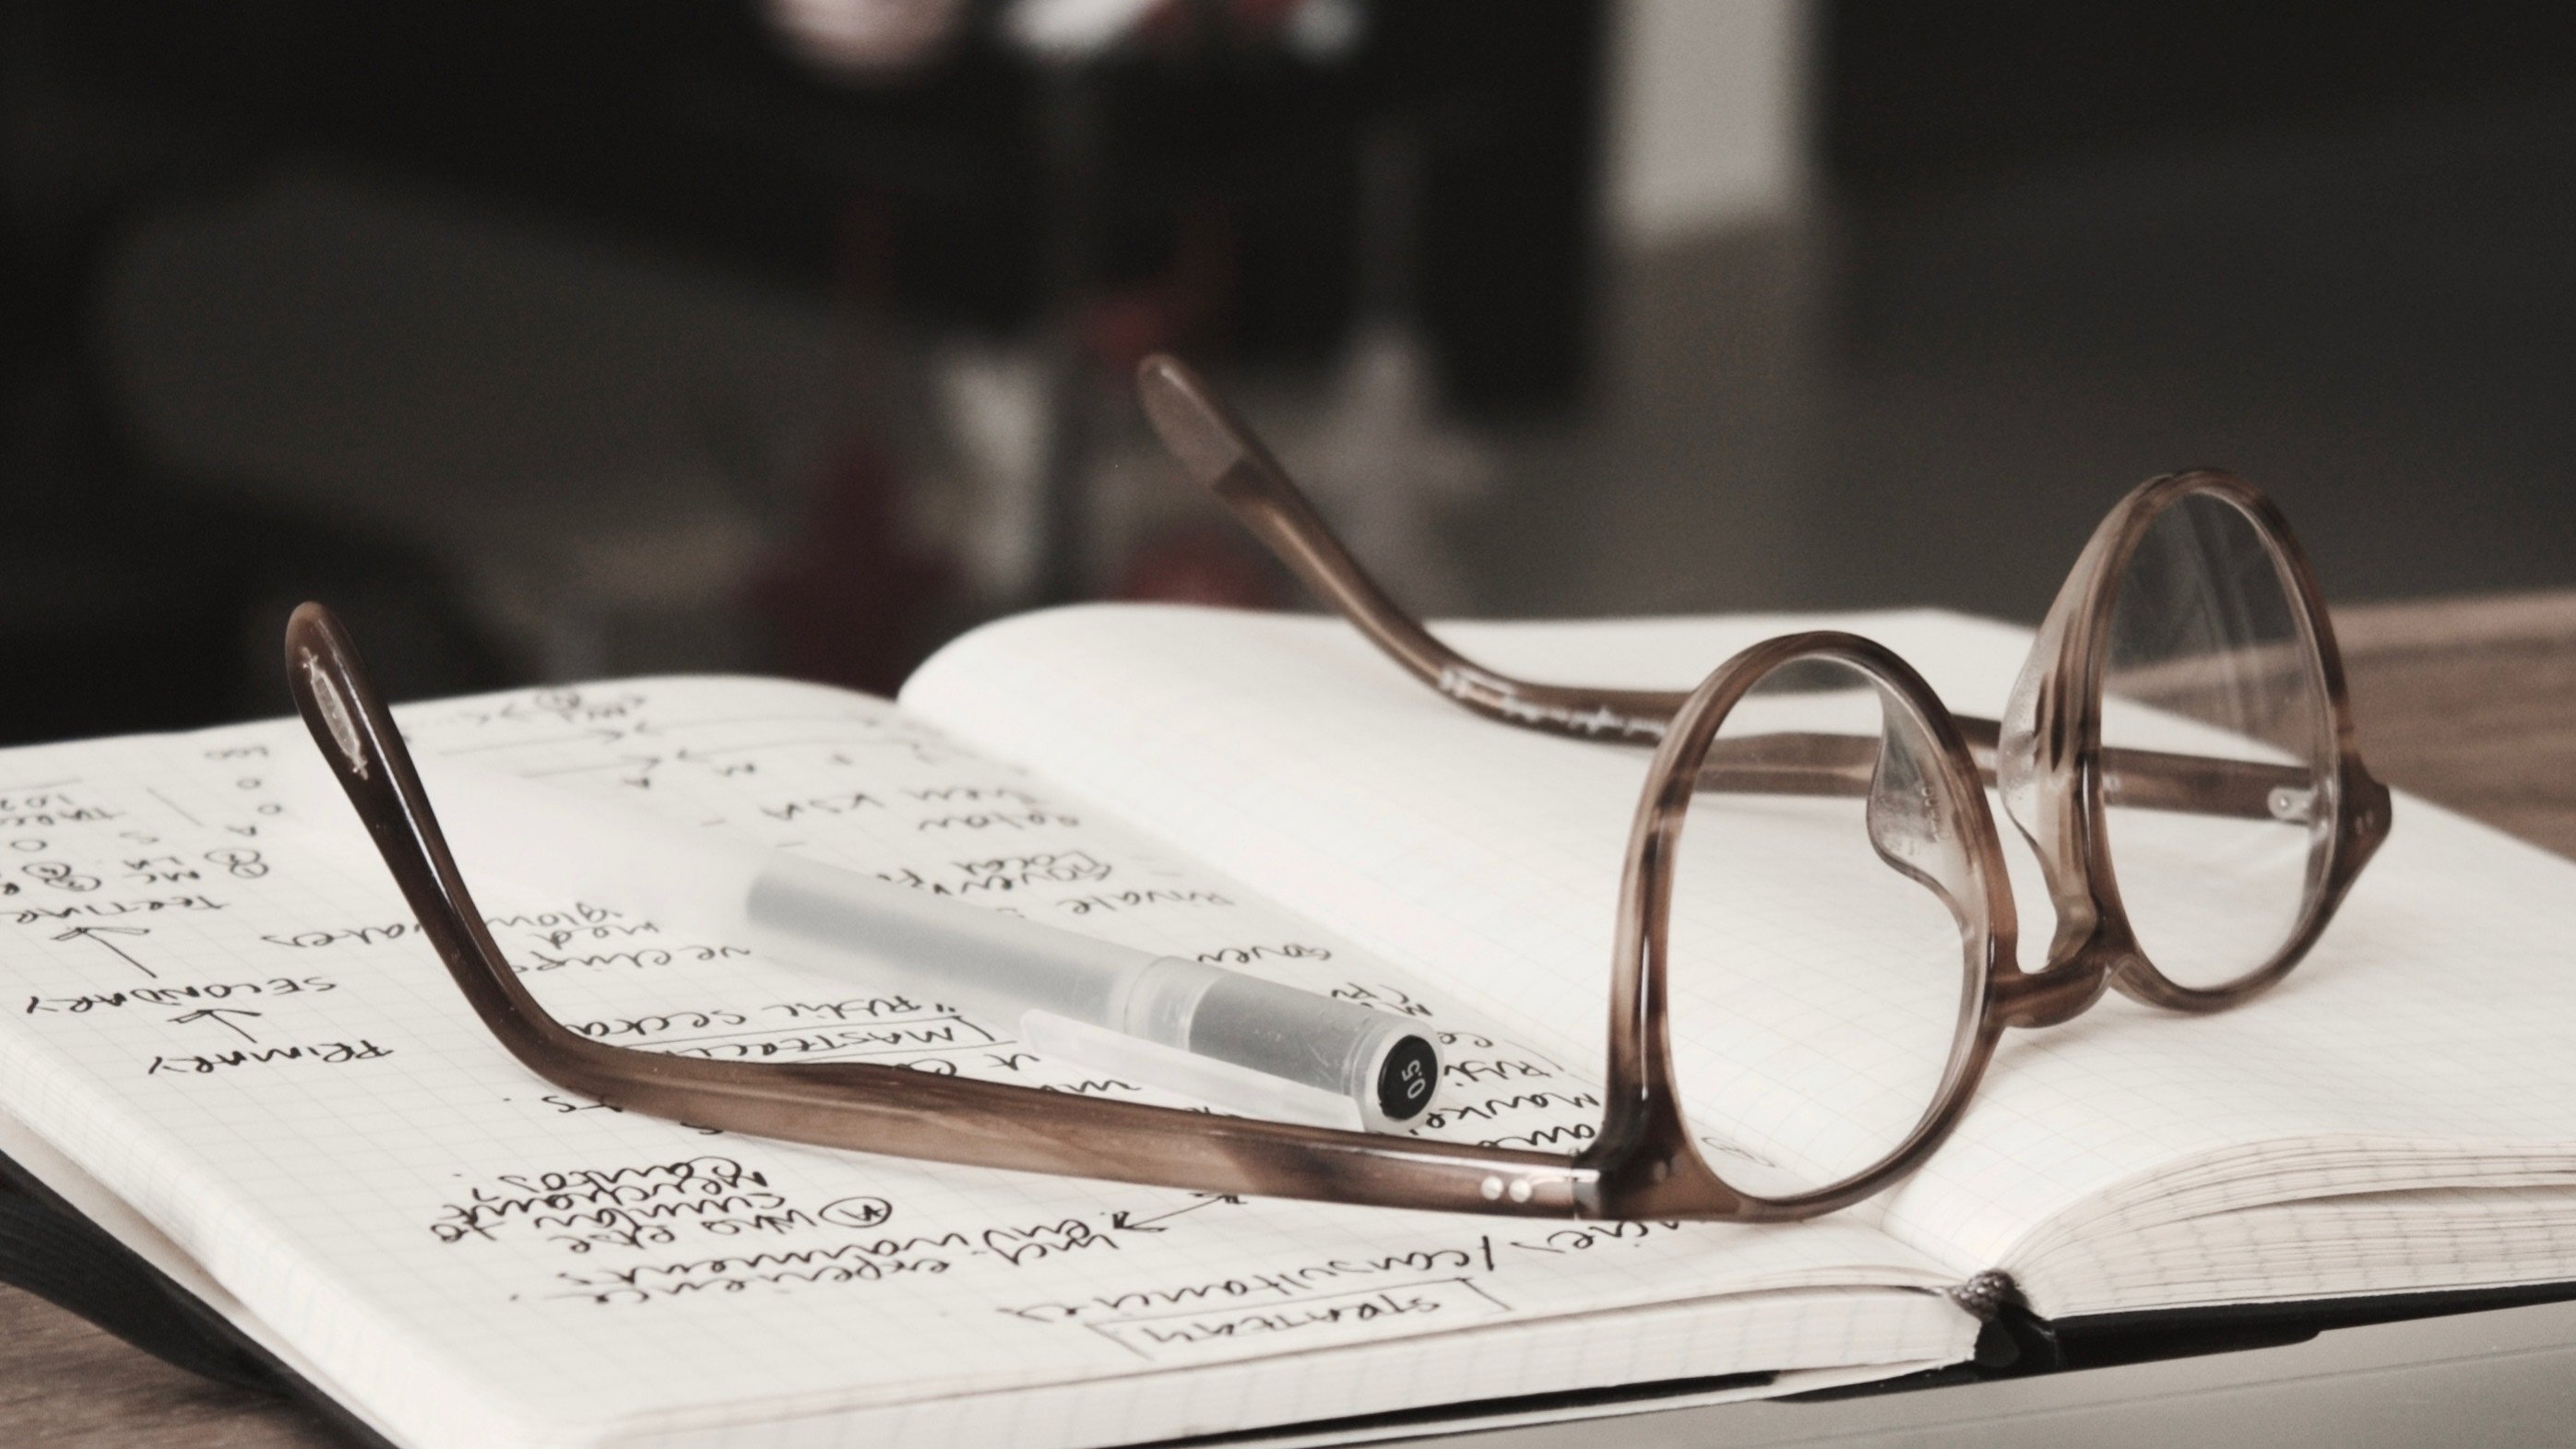 eyeglasses-on-book